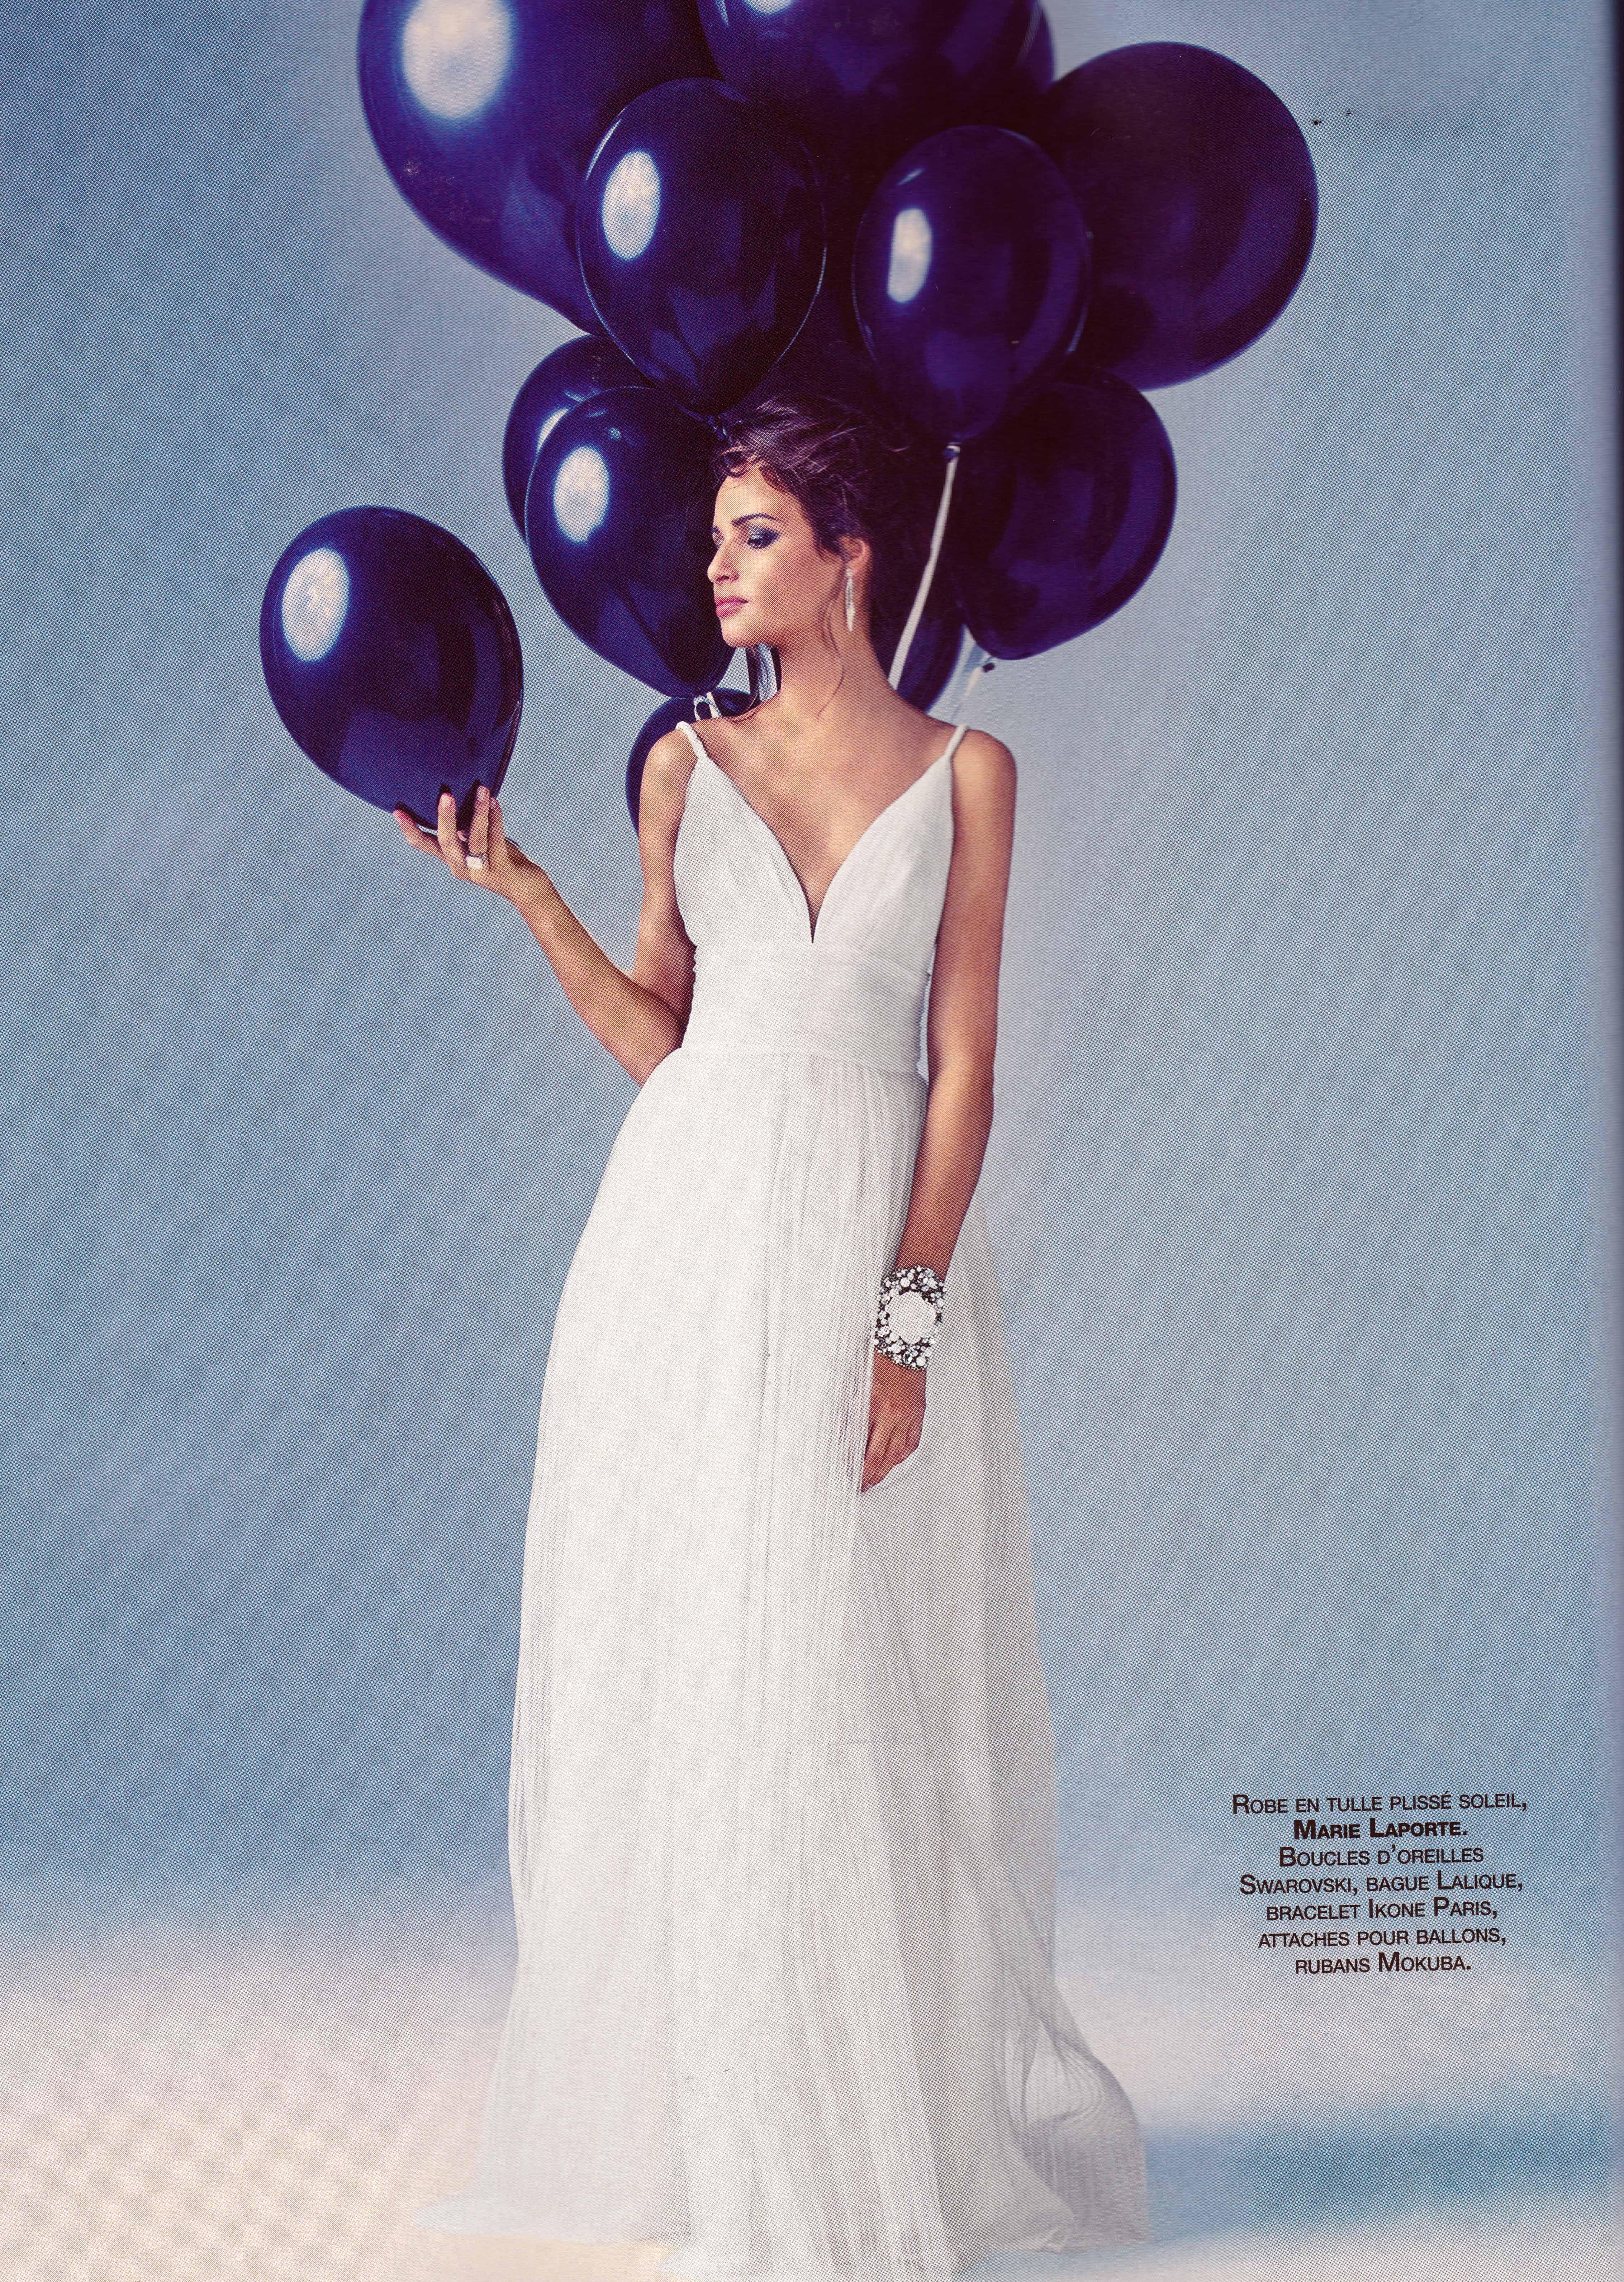 Marie laporte robe iris